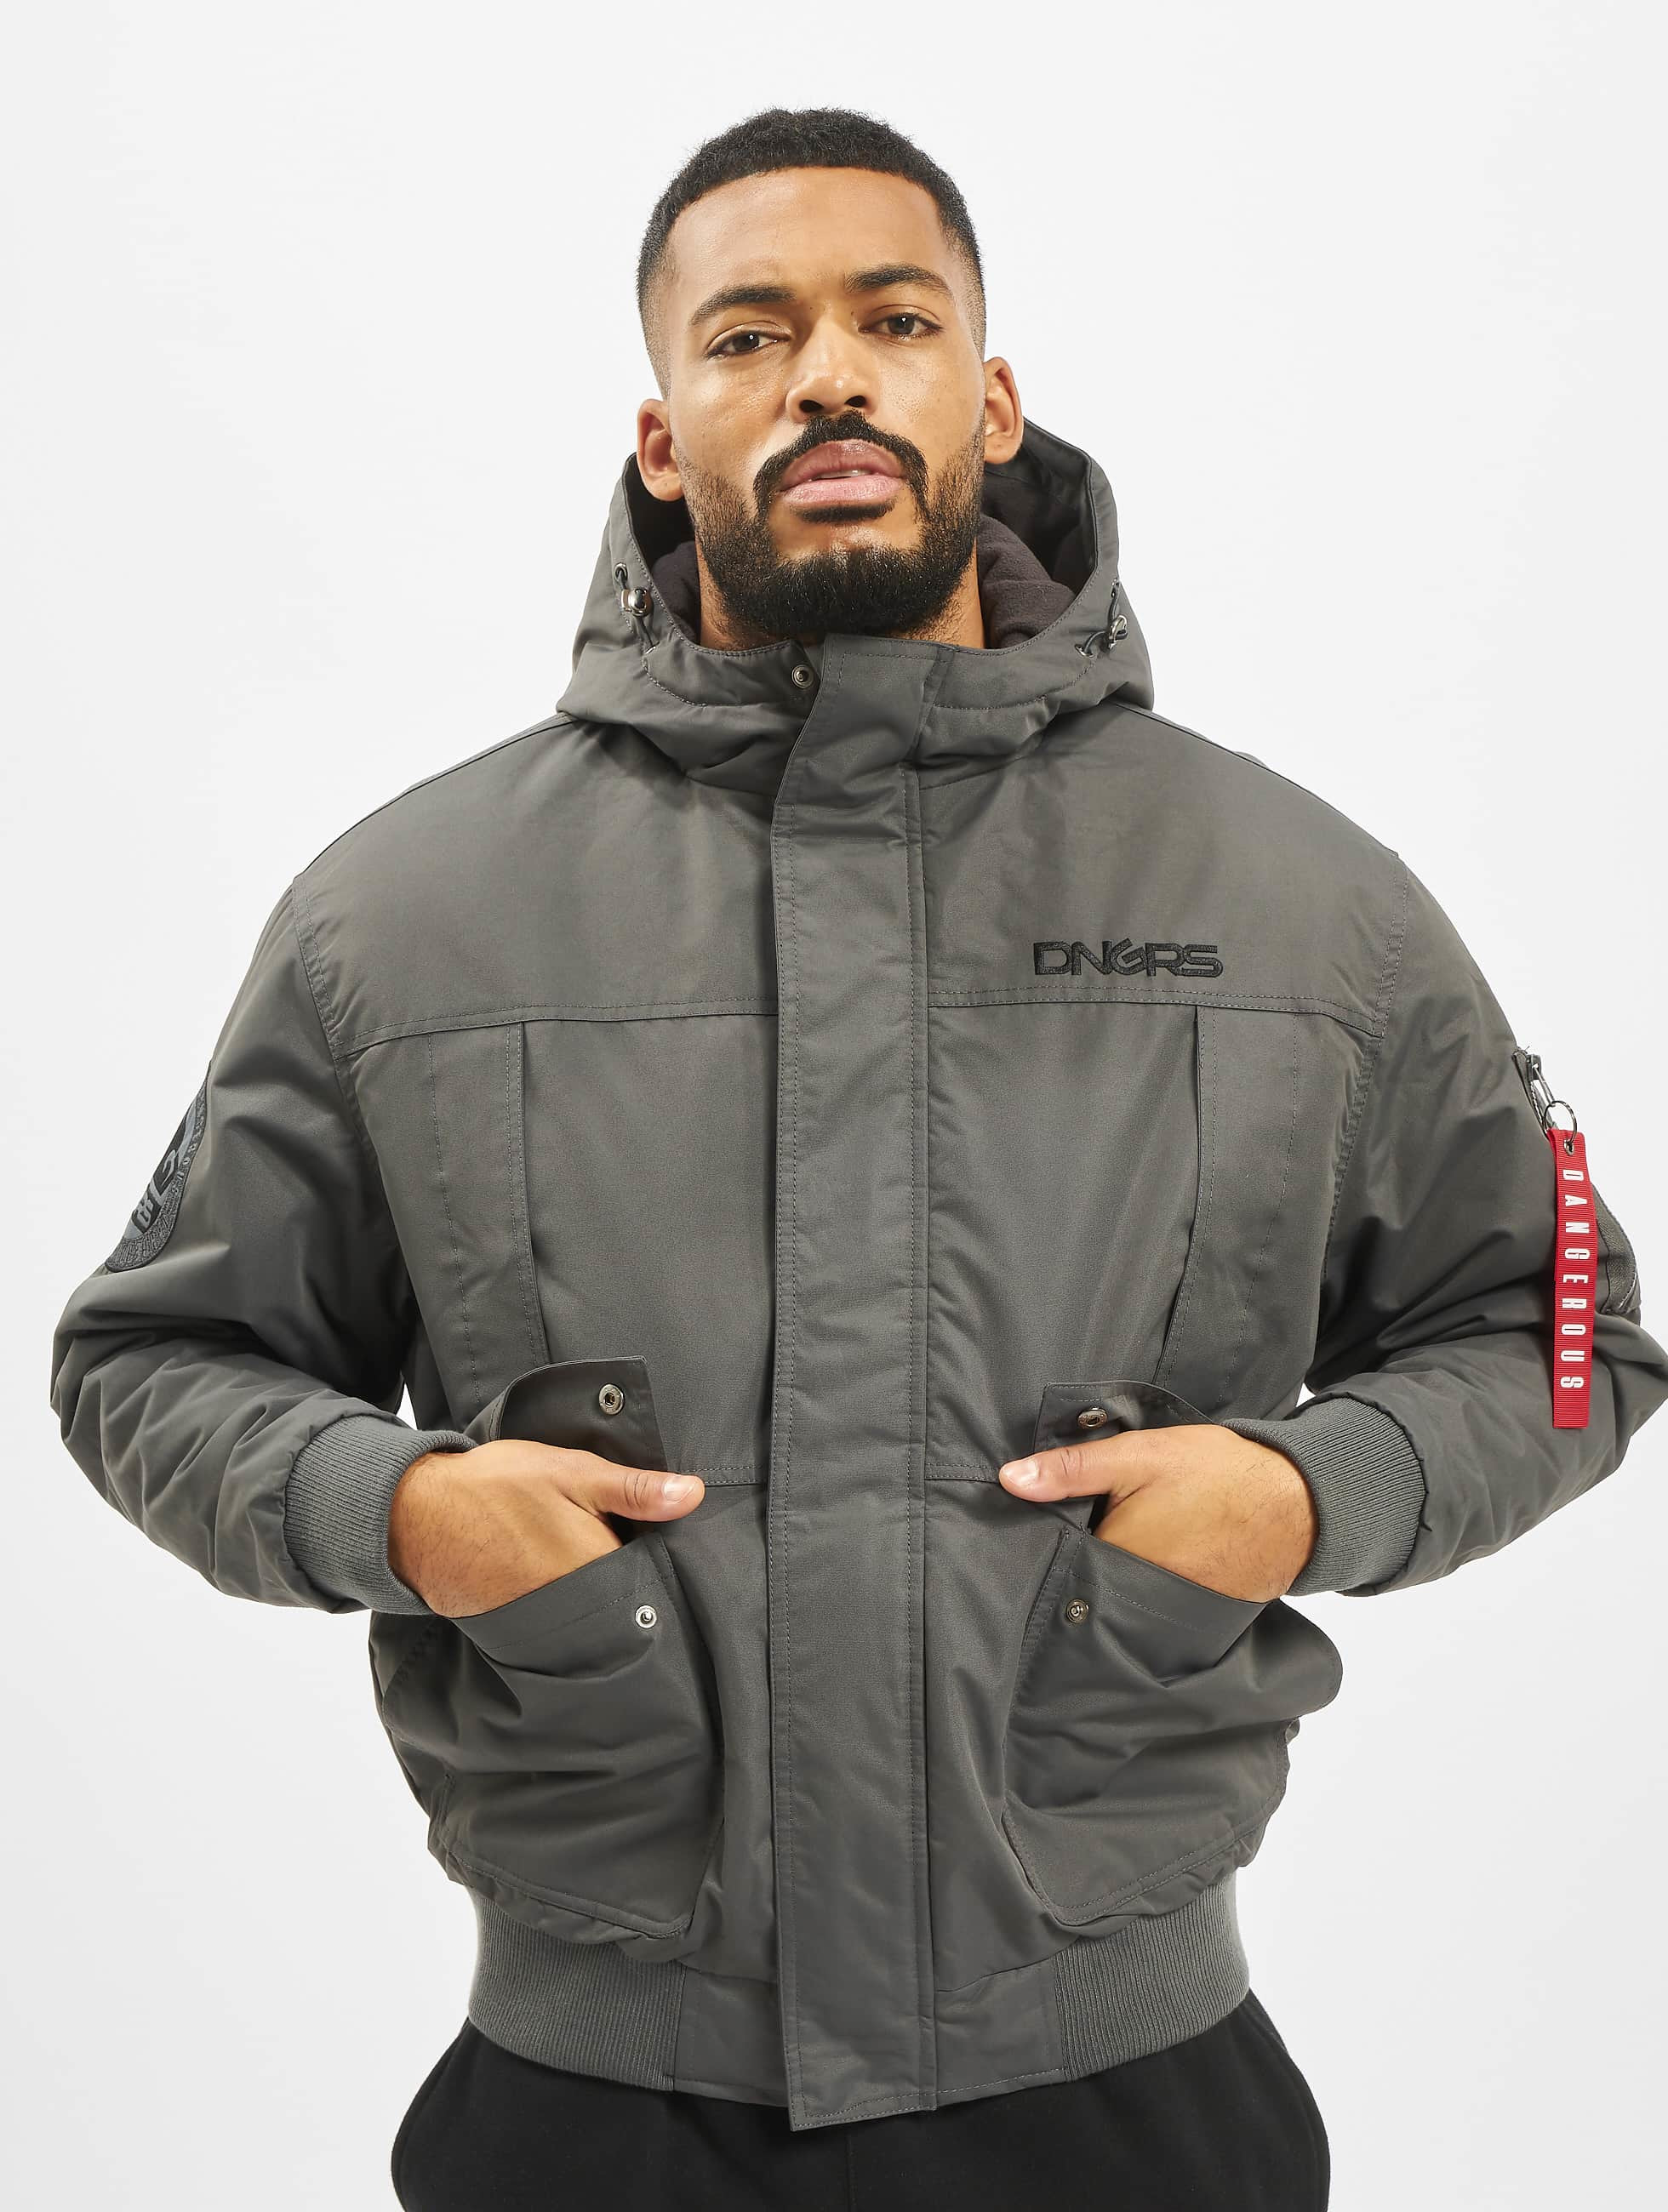 Dangerous DNGRS / Winter Jacket Grenadier in grey L